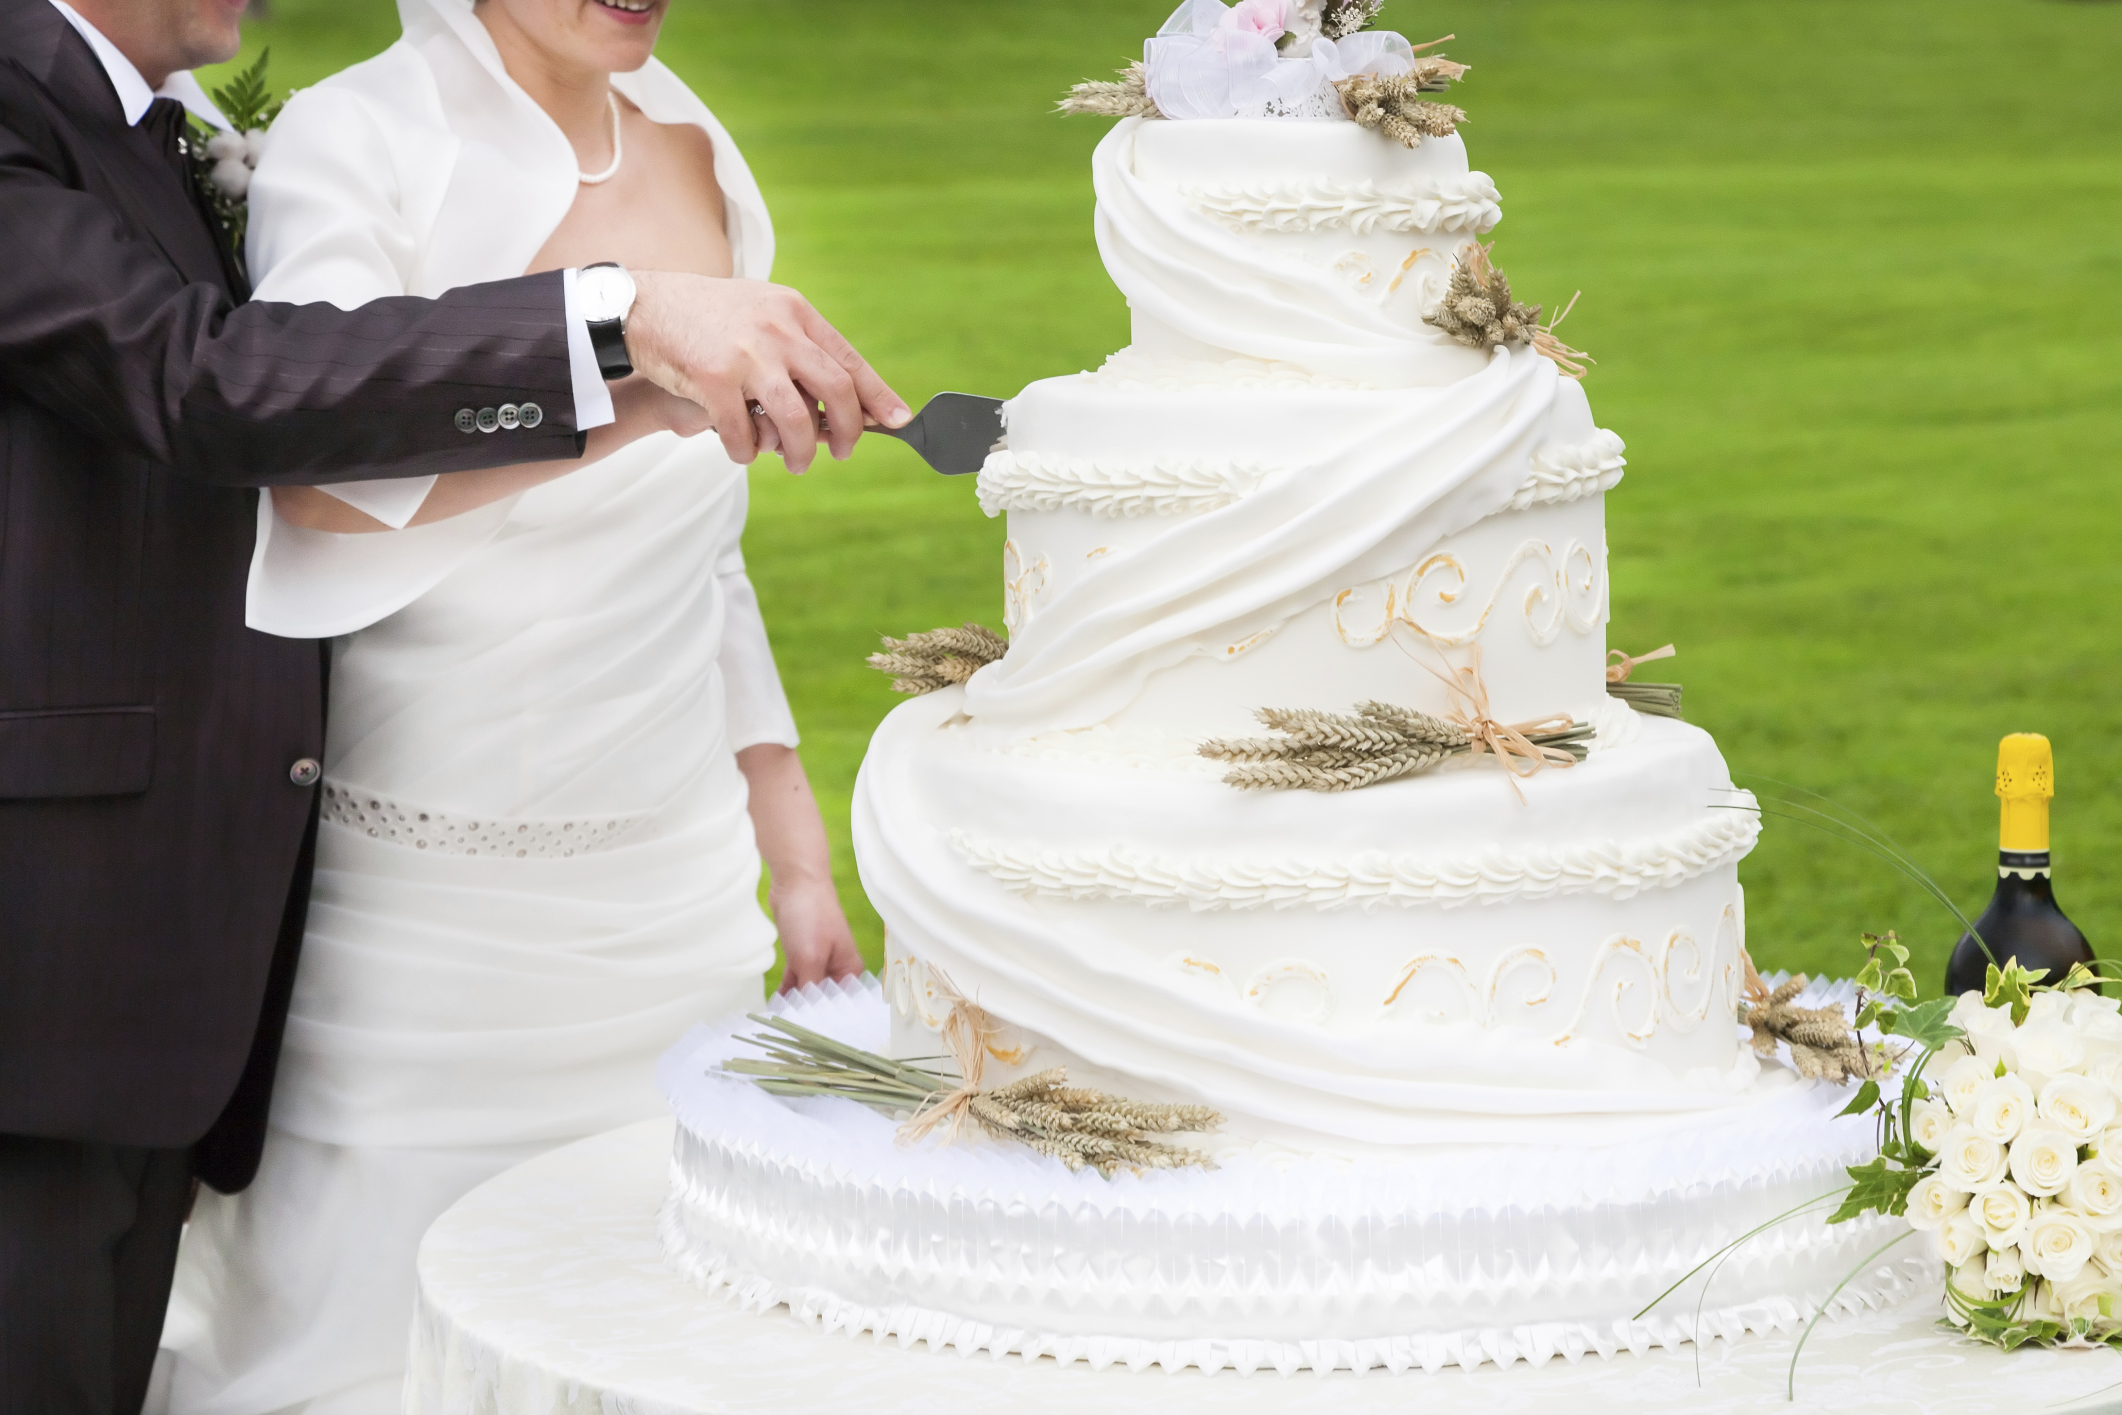 Wedding Cake Cutting Music